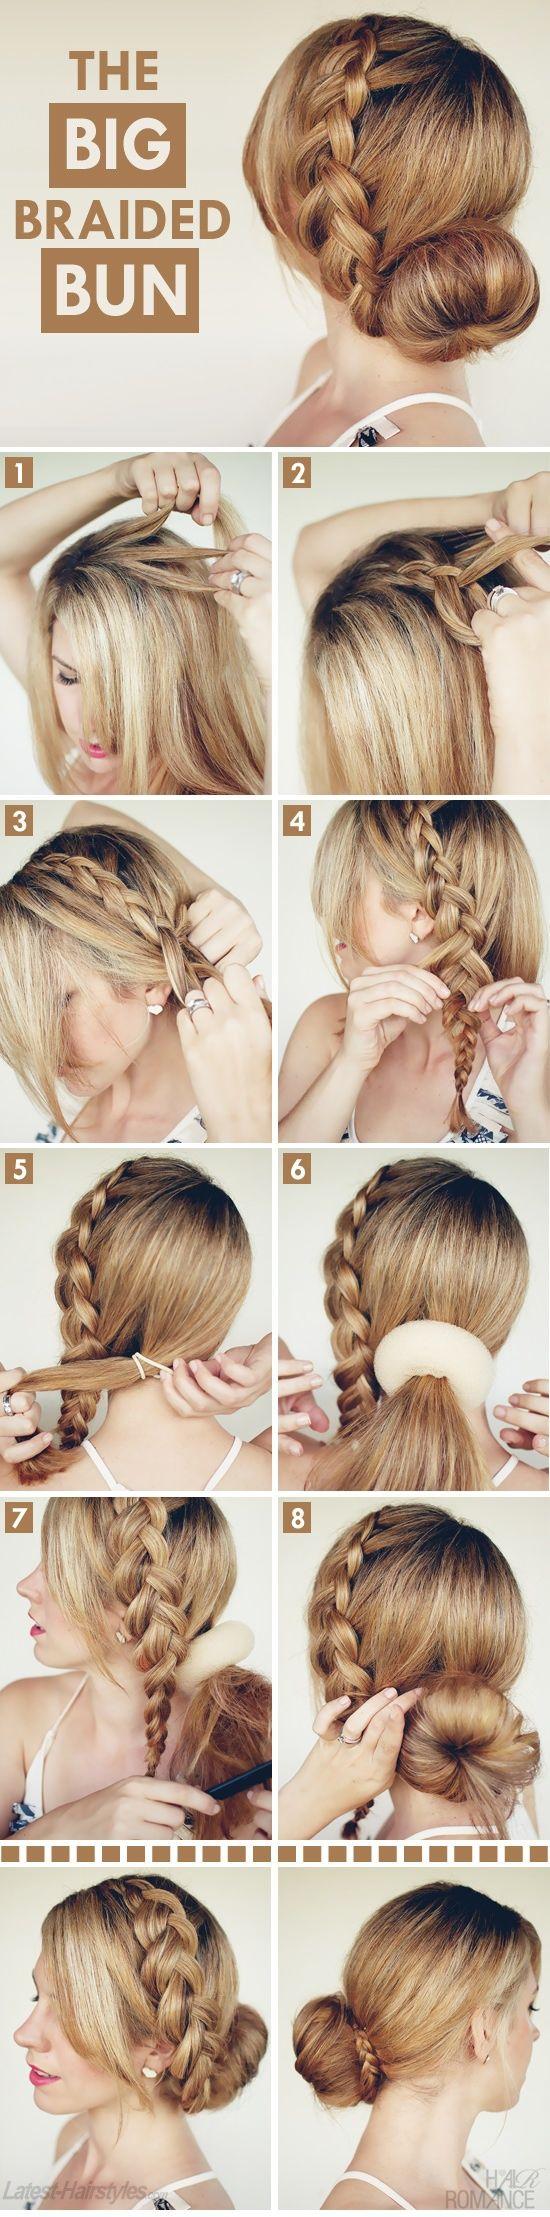 #hairstyle #hairdo #braid #DIY #tutorial